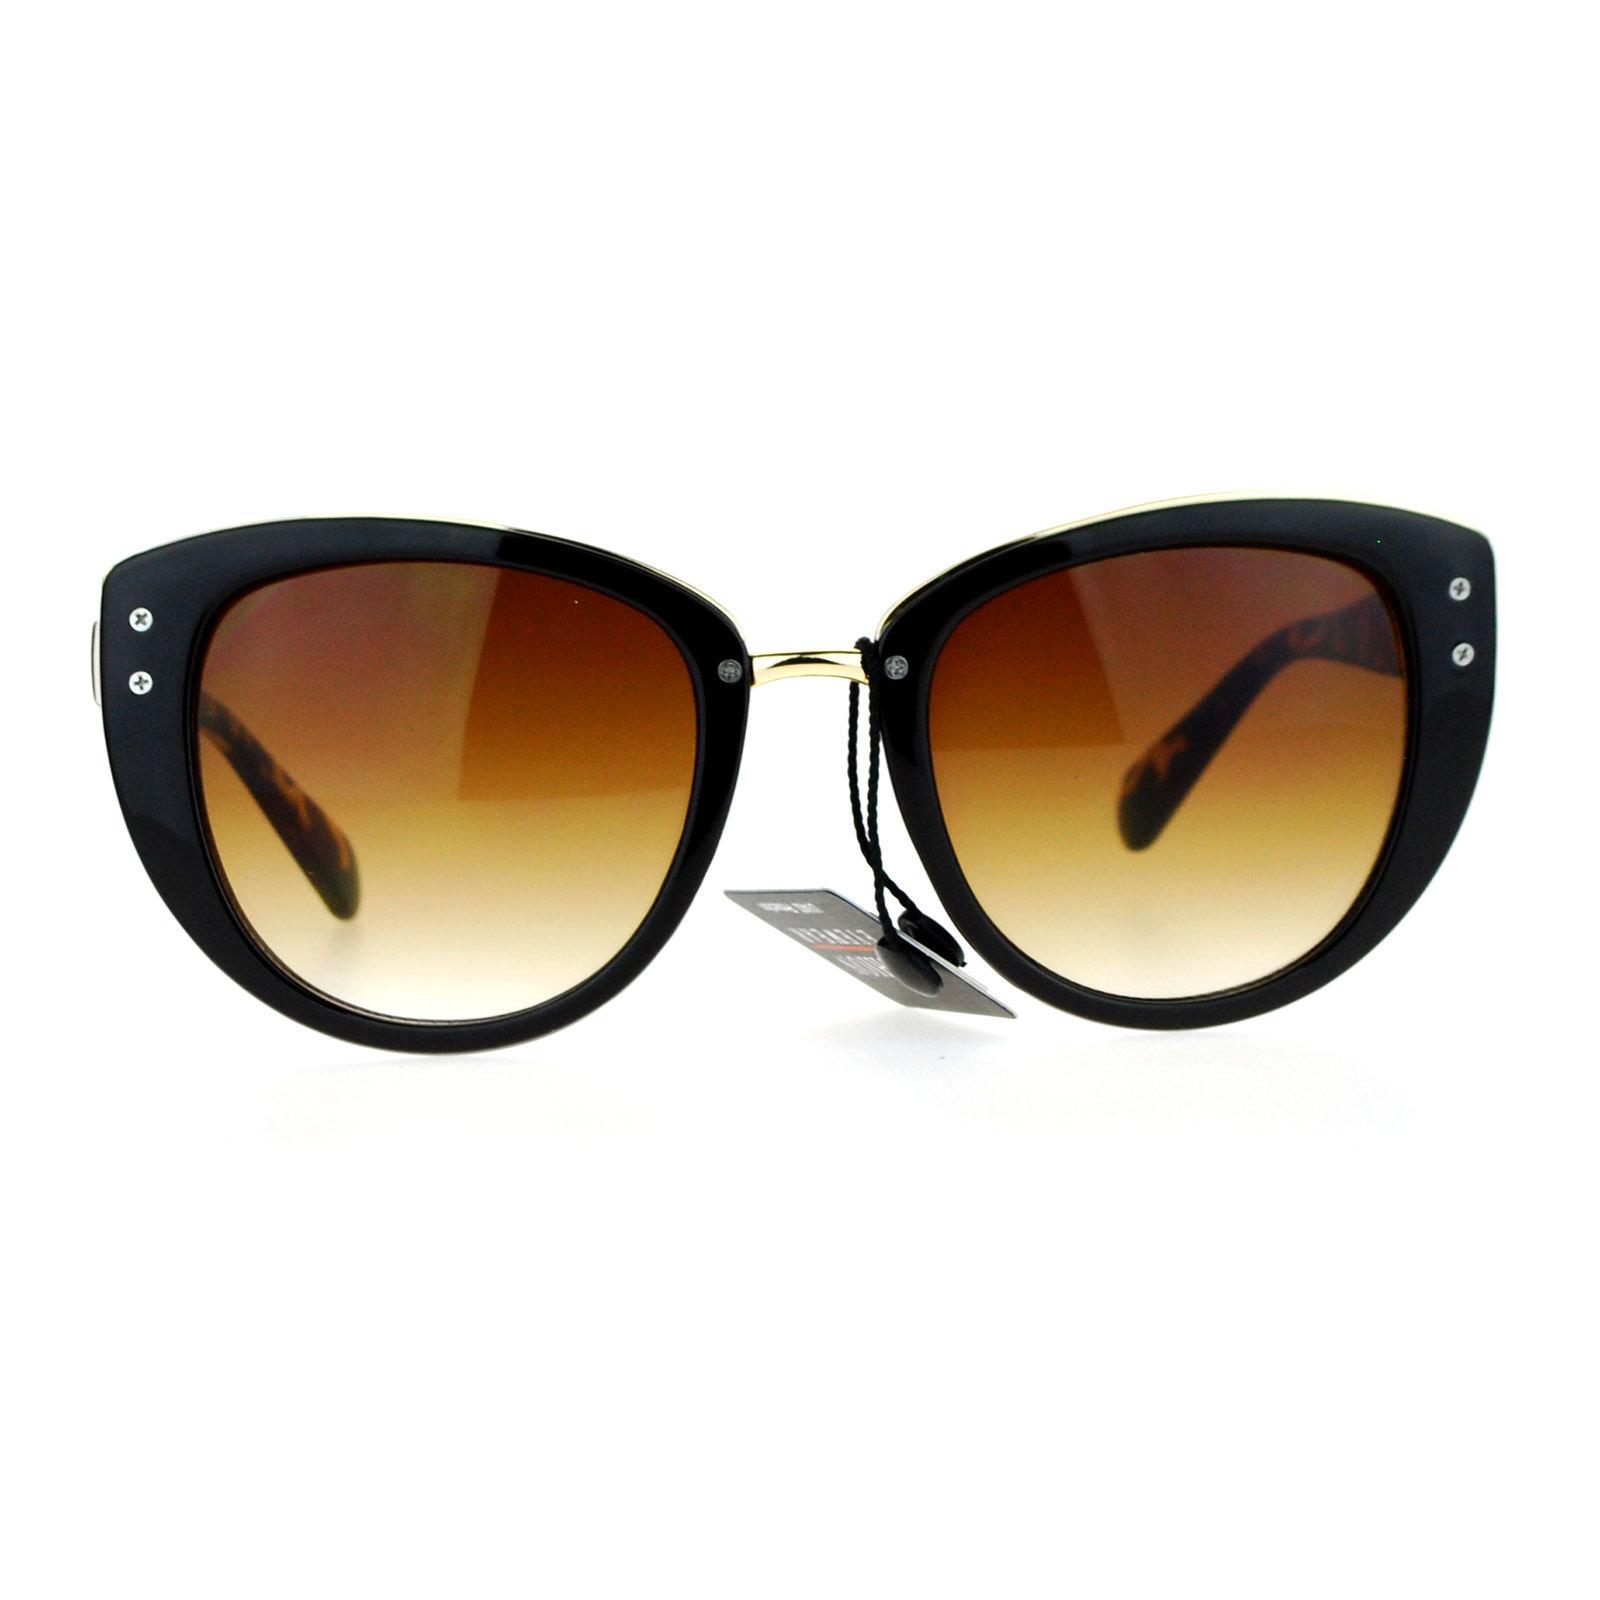 SA106 Metal Brow Oversize Cat Eye Designer Sunglasses